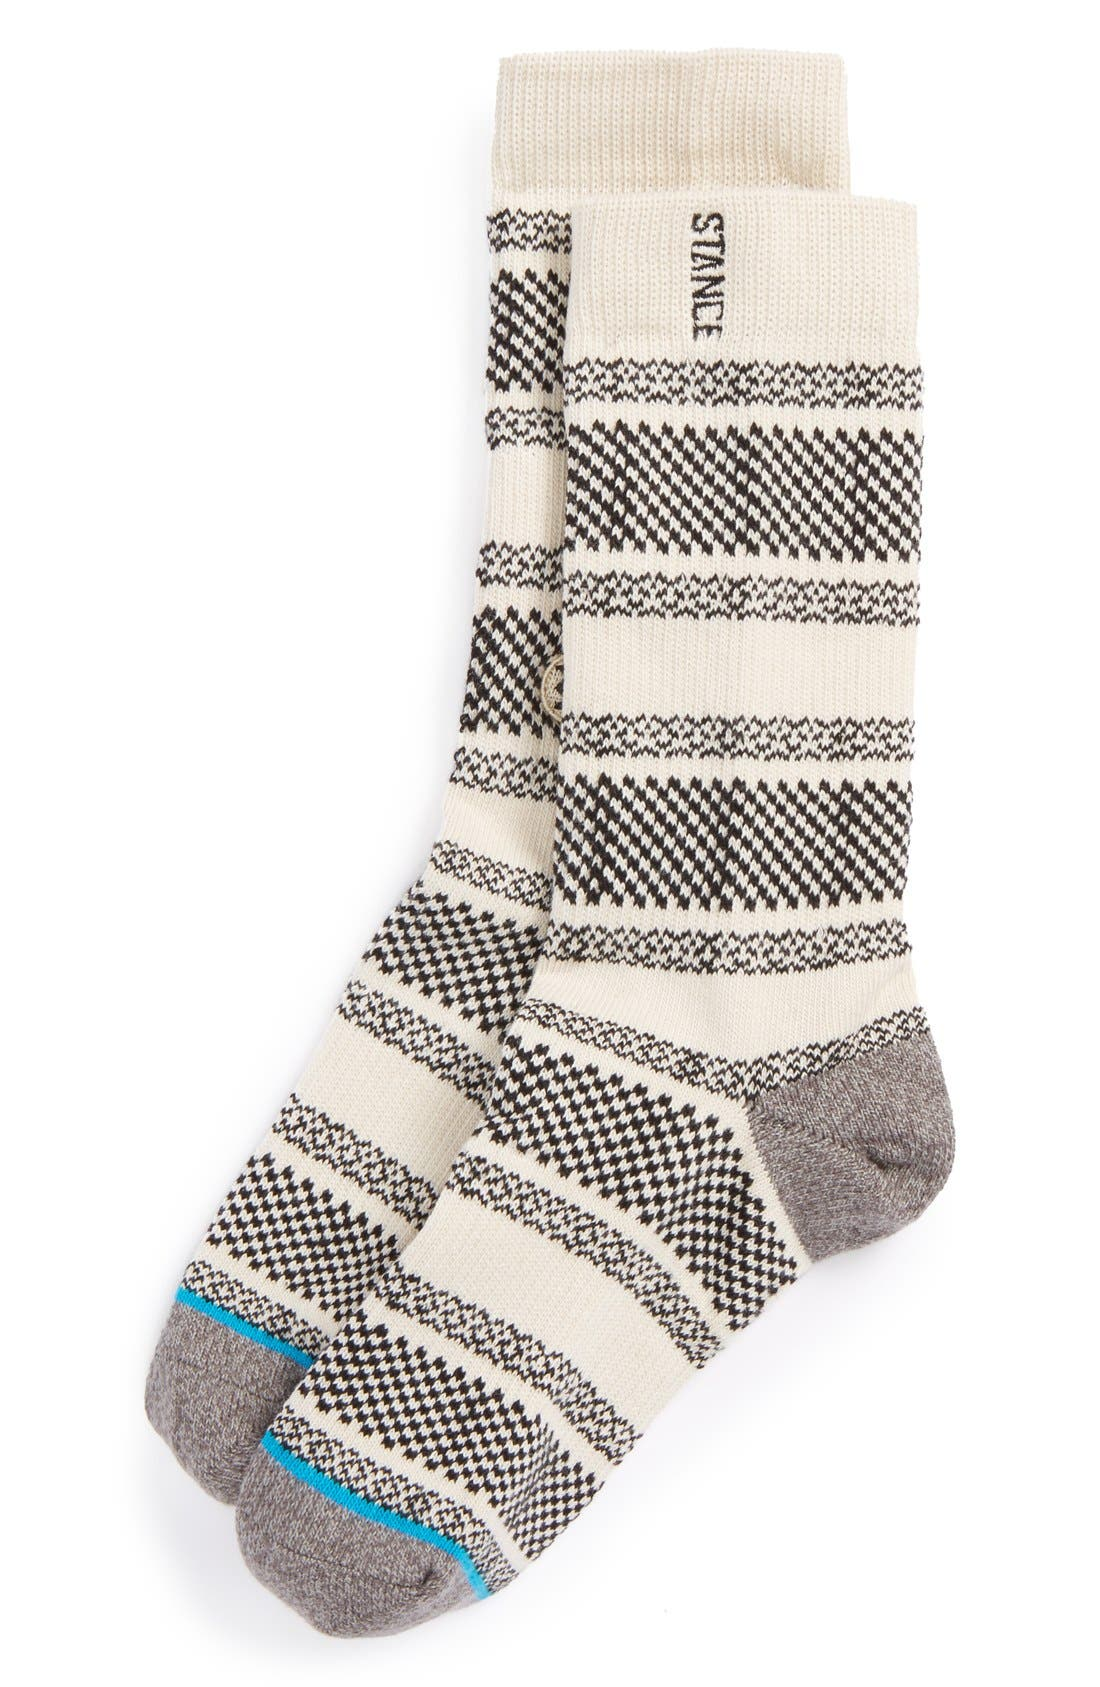 Main Image - Stance 'Helen' Socks (Big Kid)